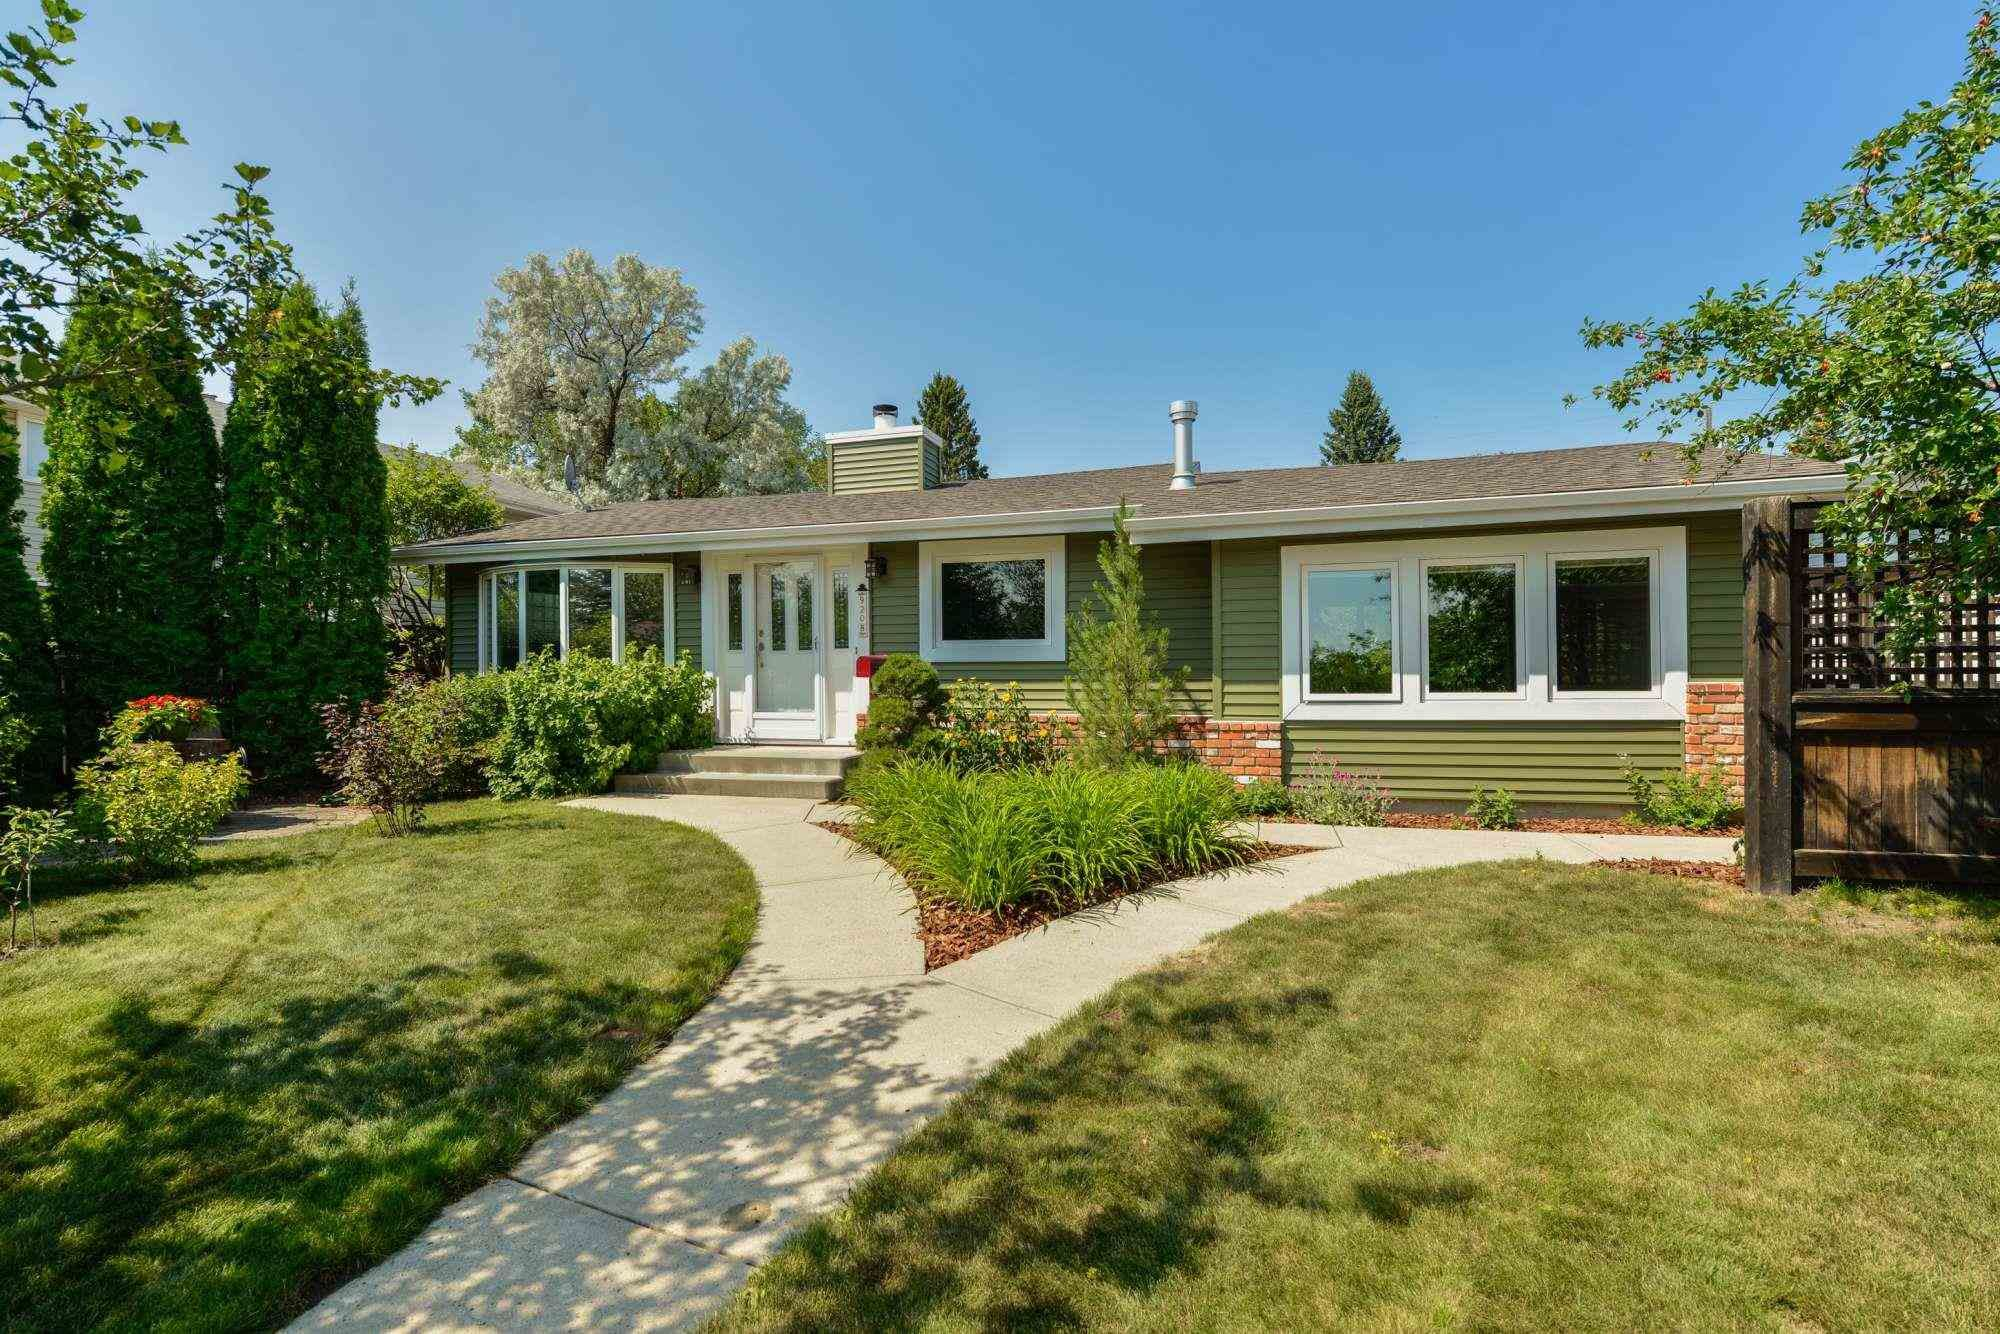 Main Photo: 9208 69 Street in Edmonton: Zone 18 House for sale : MLS®# E4253580